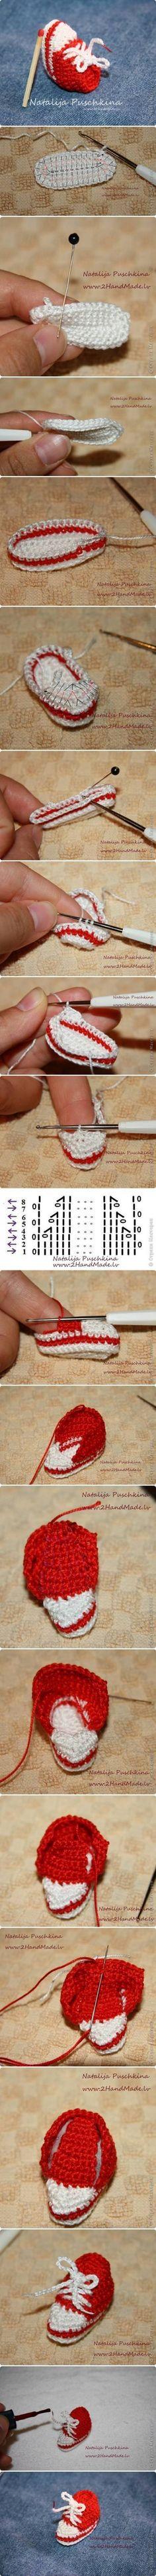 How to make Mini Crochet Sneaker step by step DIY